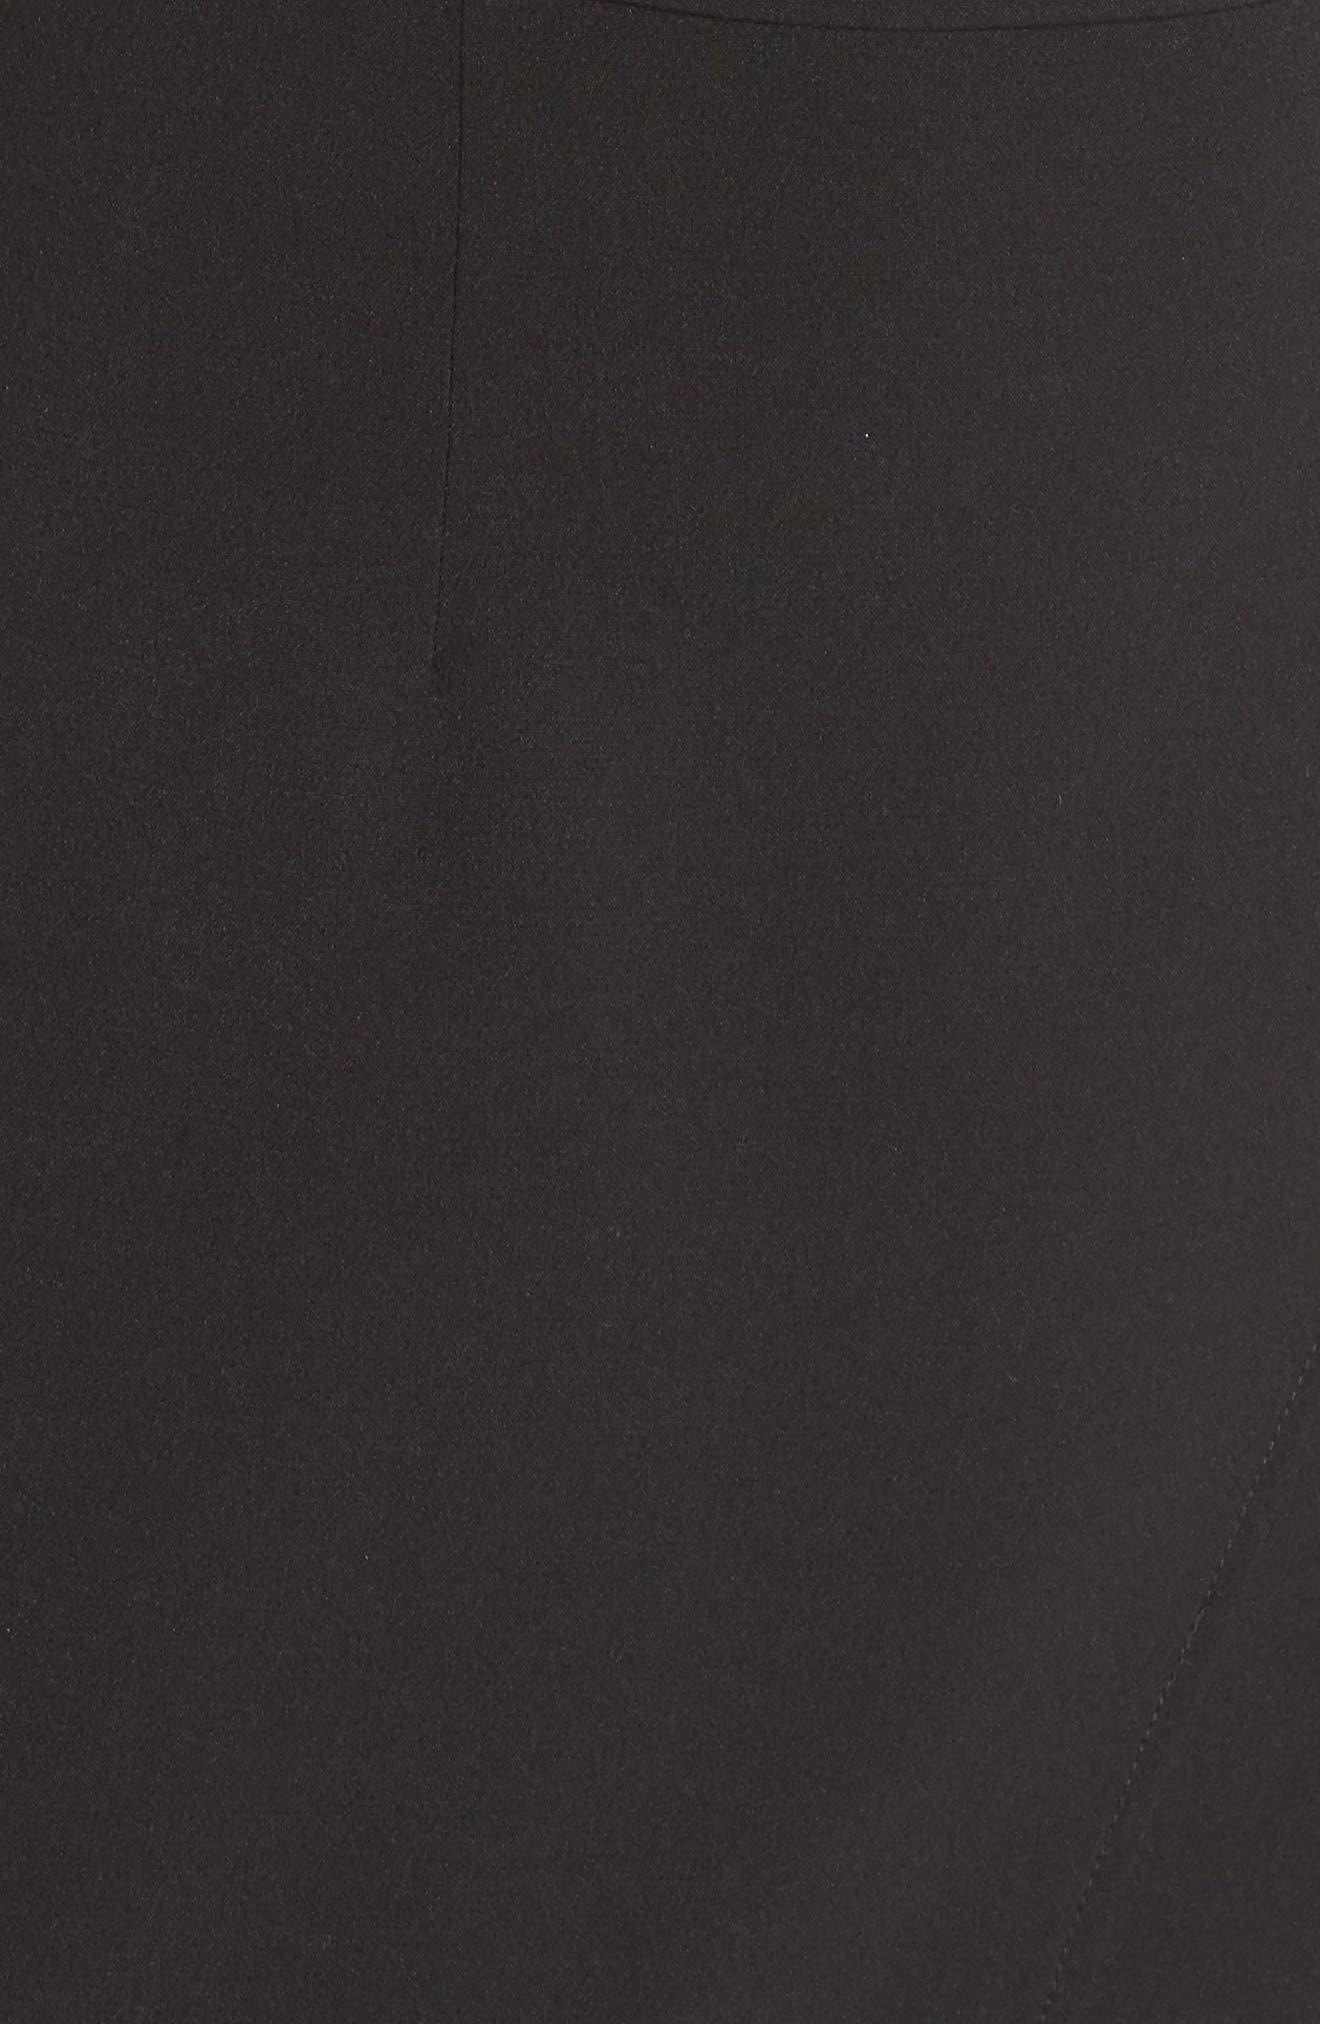 Halter Asymmetrical Sheath Dress,                             Alternate thumbnail 6, color,                             Black